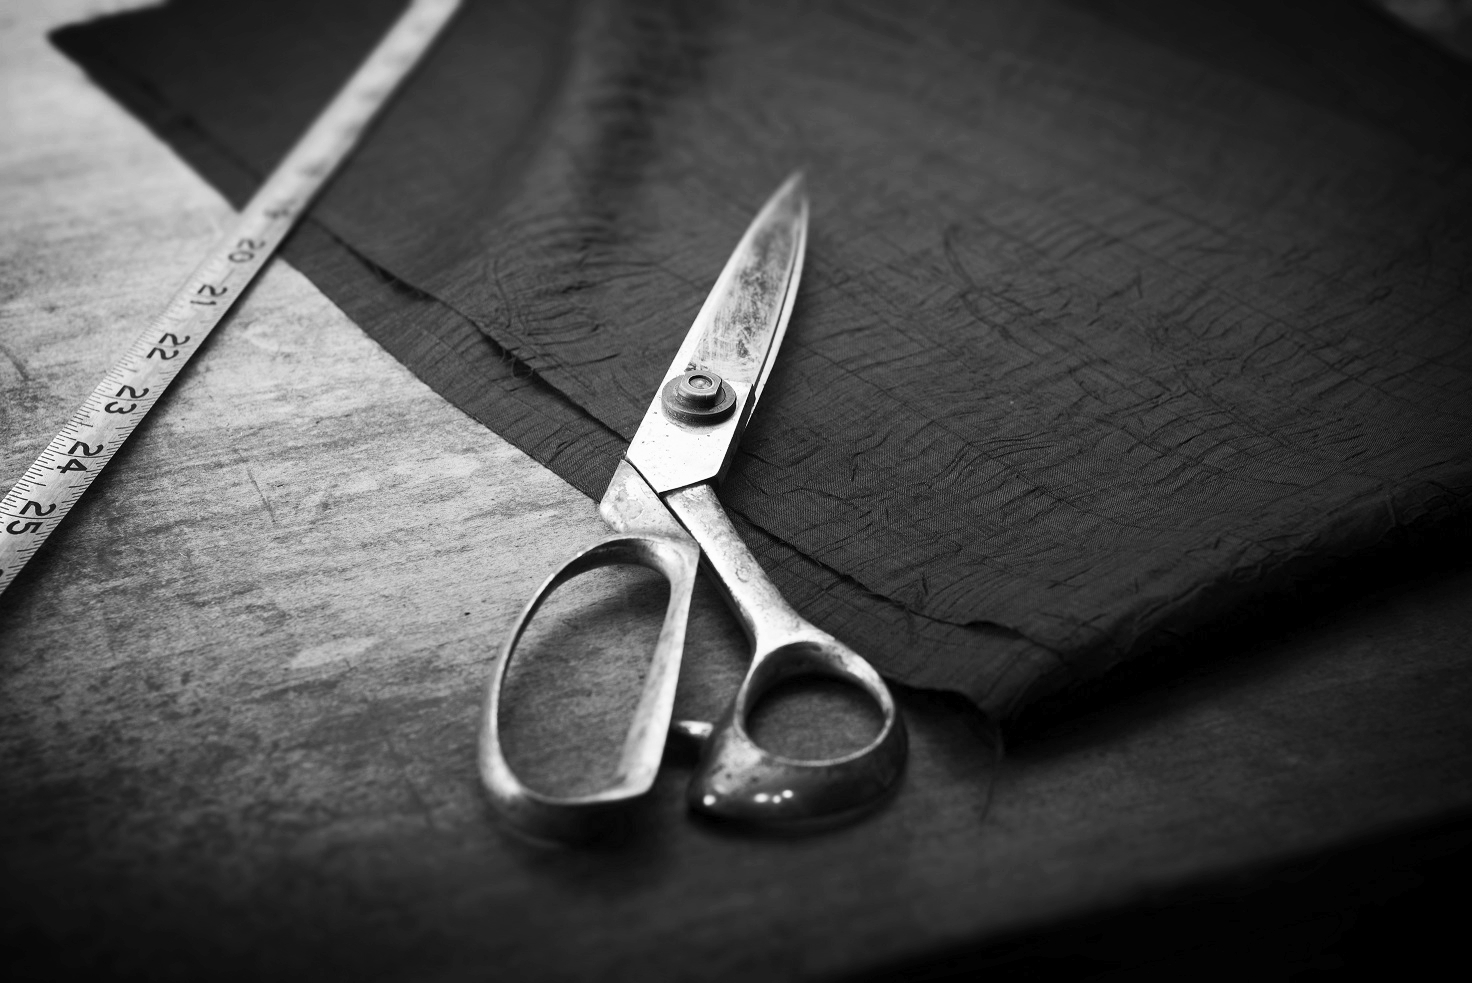 Vermaakservice | Streefland Textiles